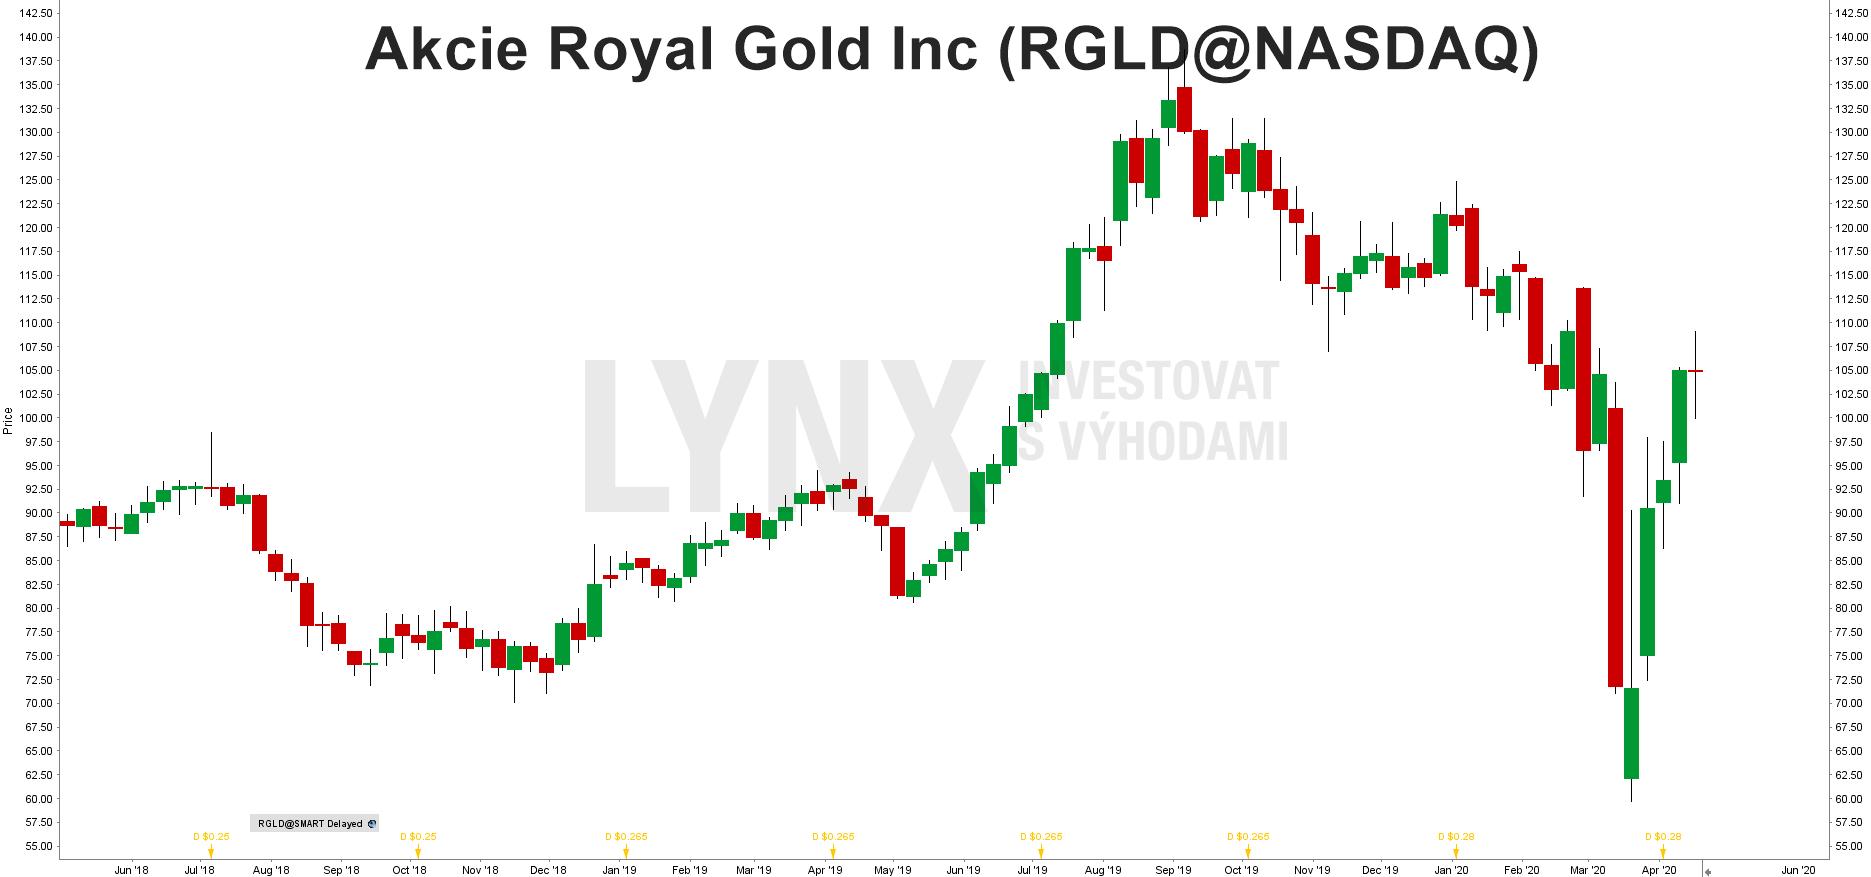 Graf akcie Royal Gold (RGLD)